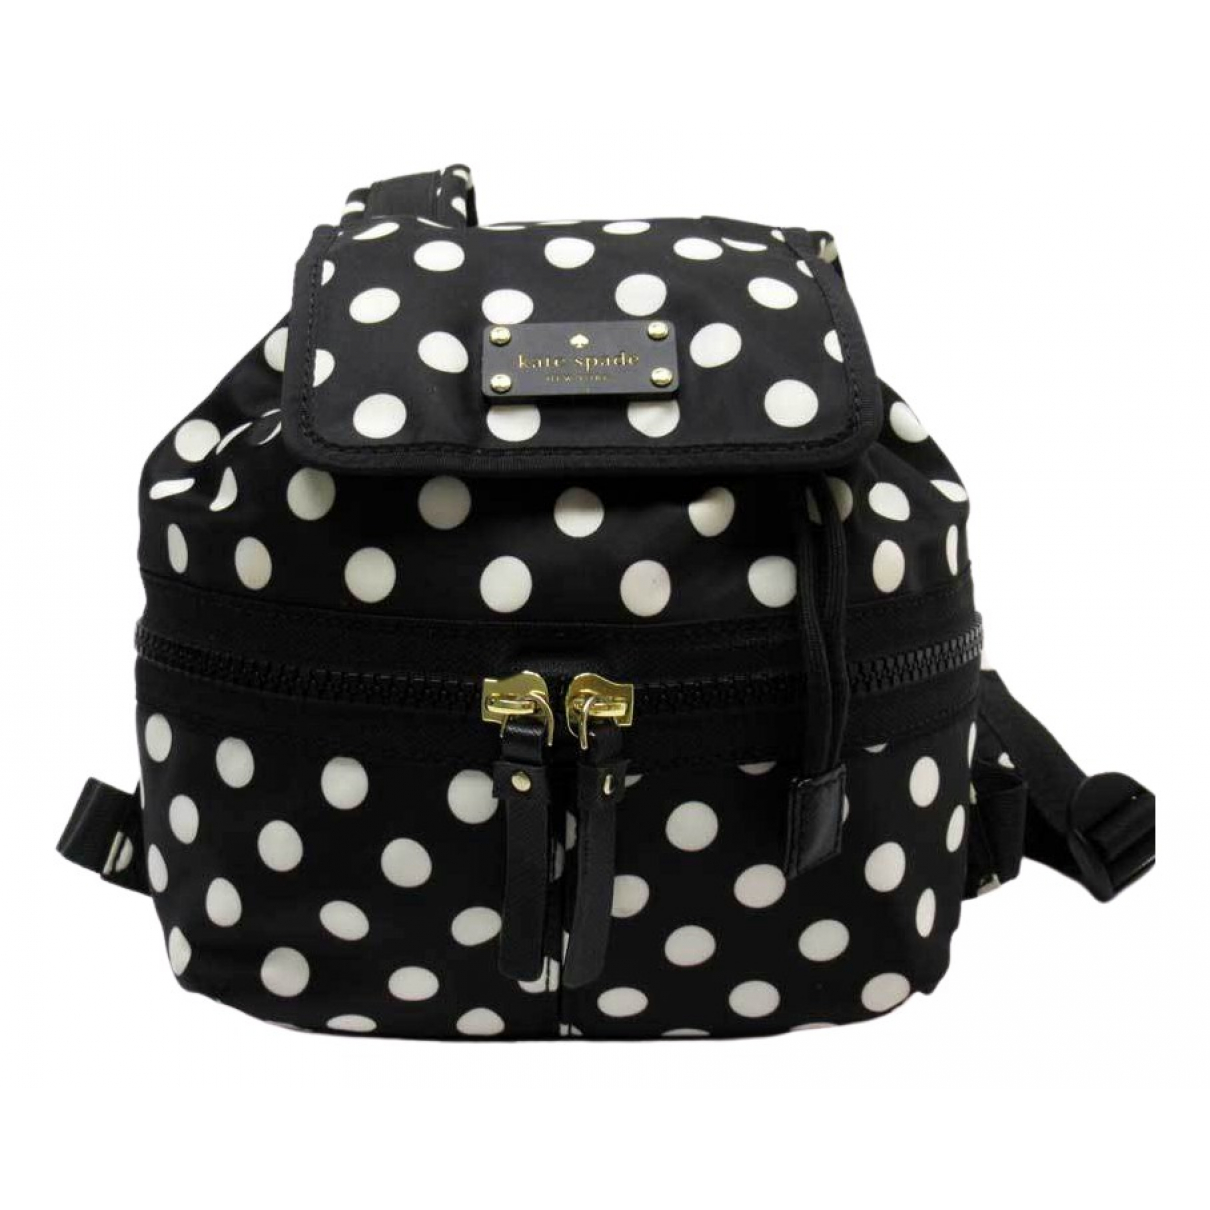 Kate Spade \N Black Leather handbag for Women \N